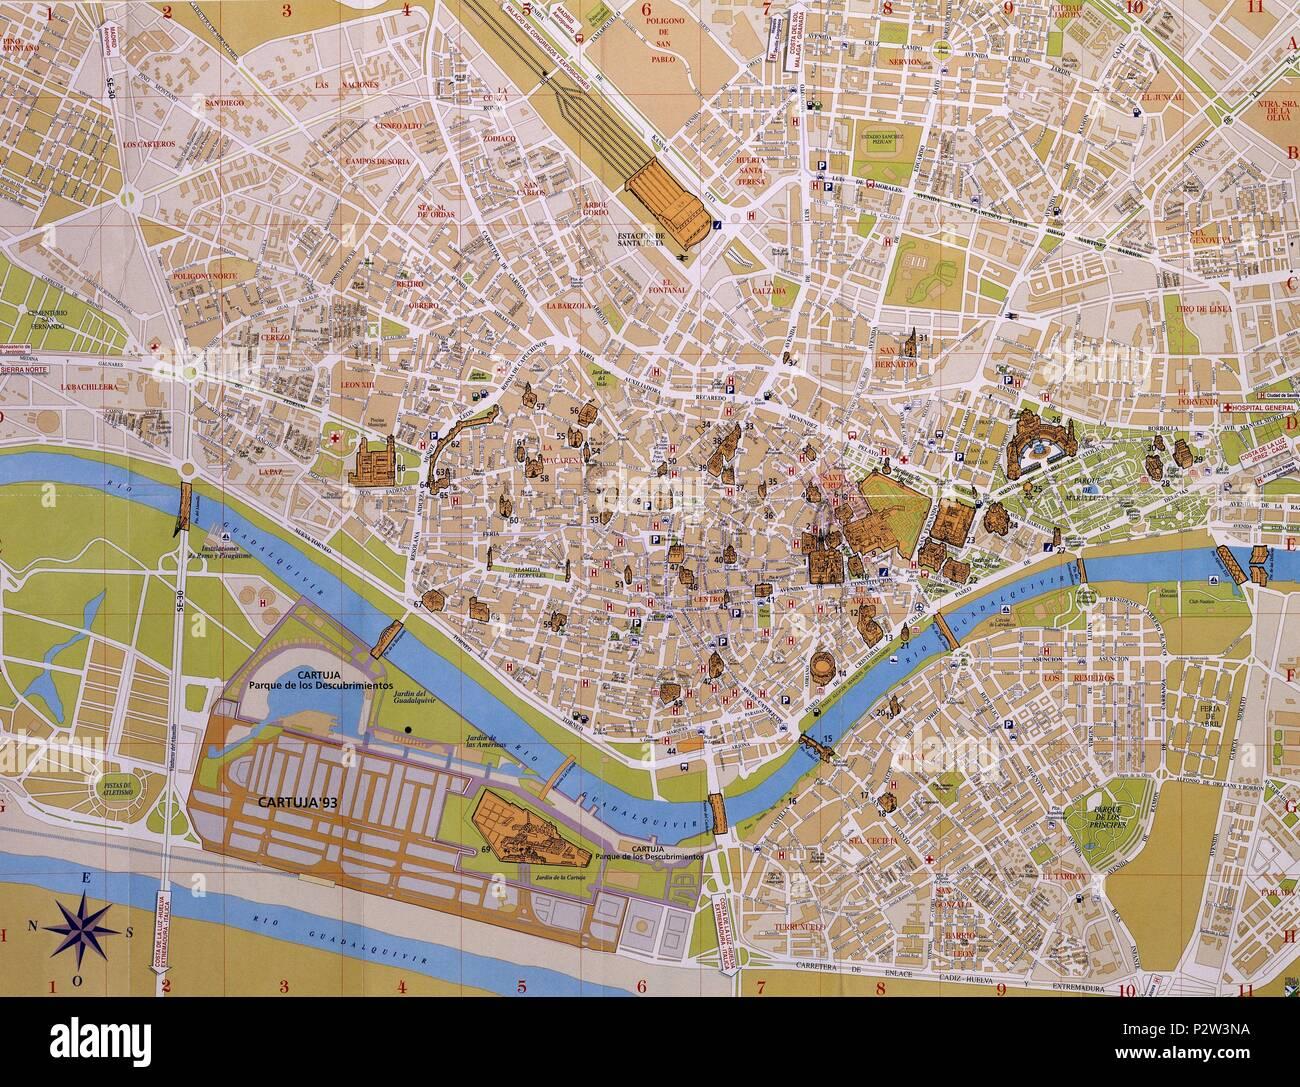 Plano Turistico De La Ciudad De Sevilla Stock Photo 208305478 Alamy